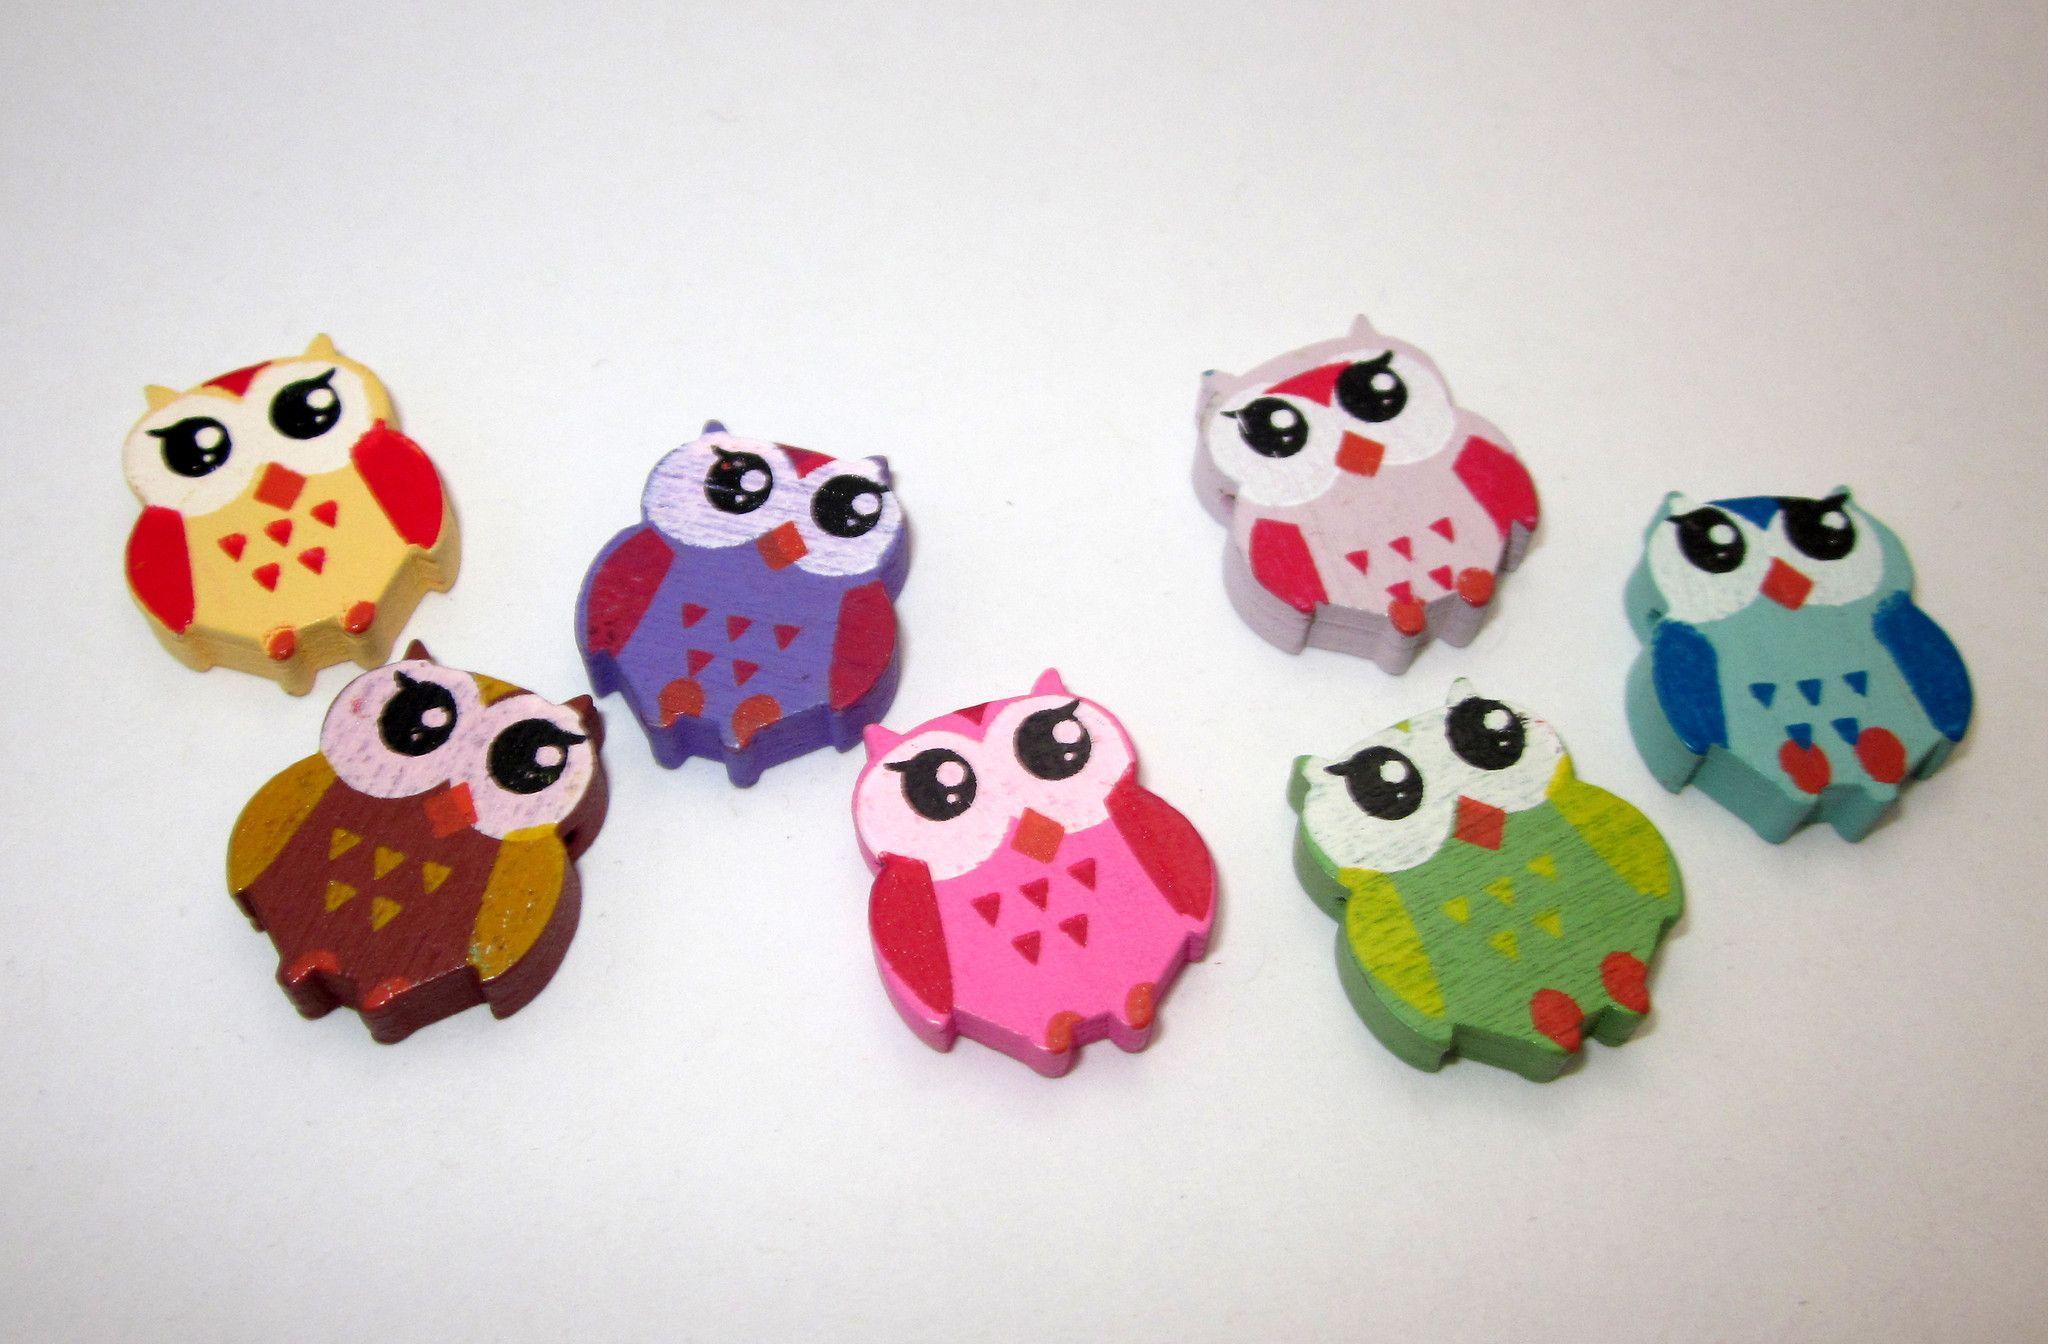 50 Wooden Owl Craft Beads